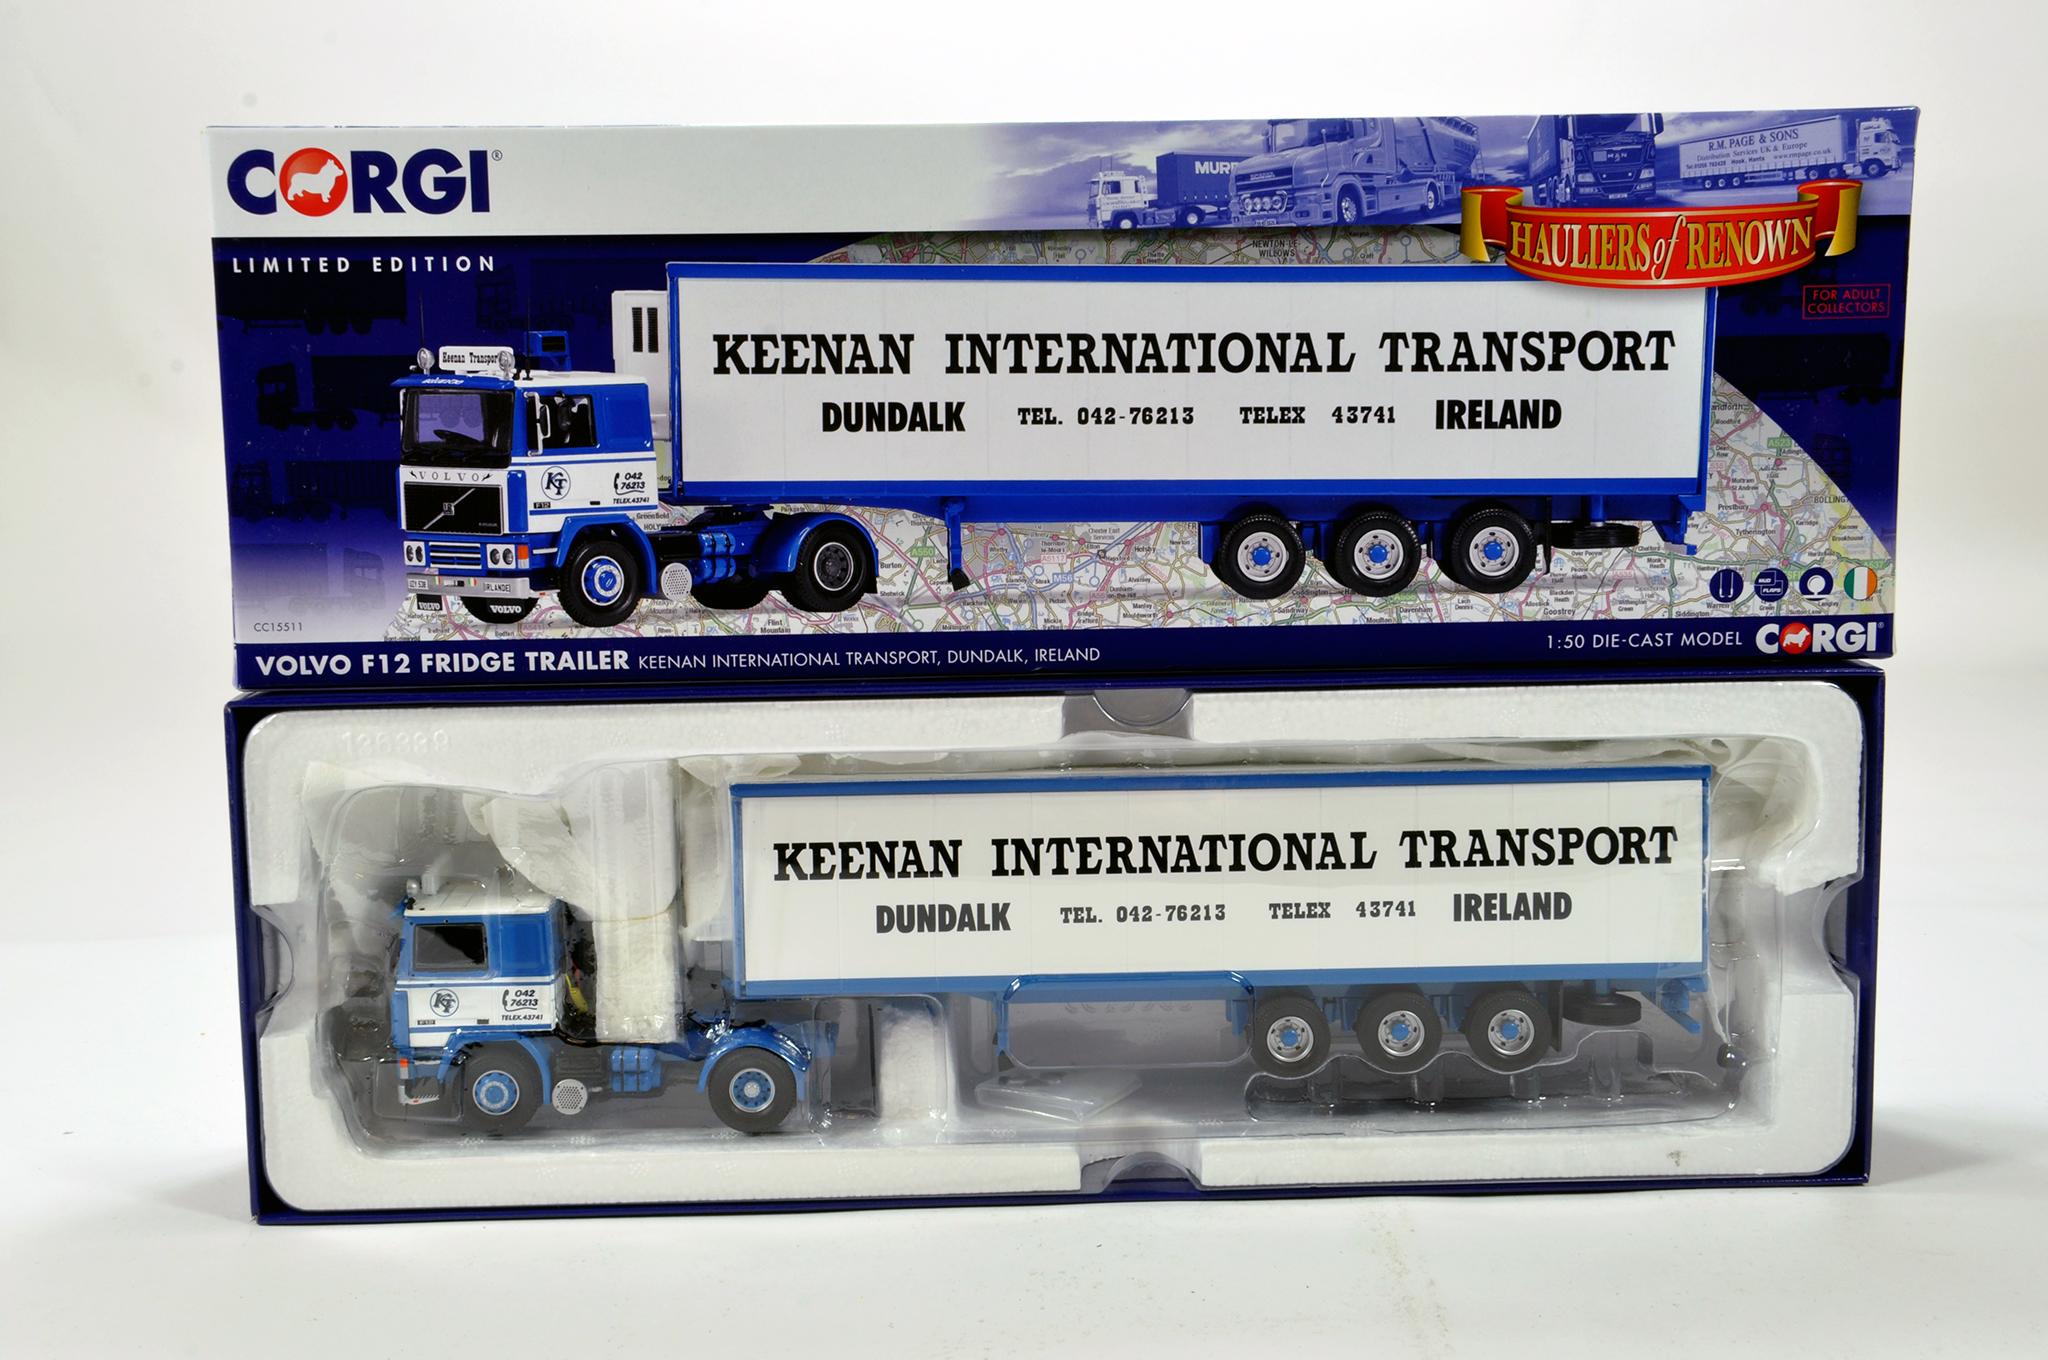 Lot 40 - Corgi 1/50 diecast truck issue comprising No. CC15511 Volvo F12 Fridge Trailer in livery of Keenan